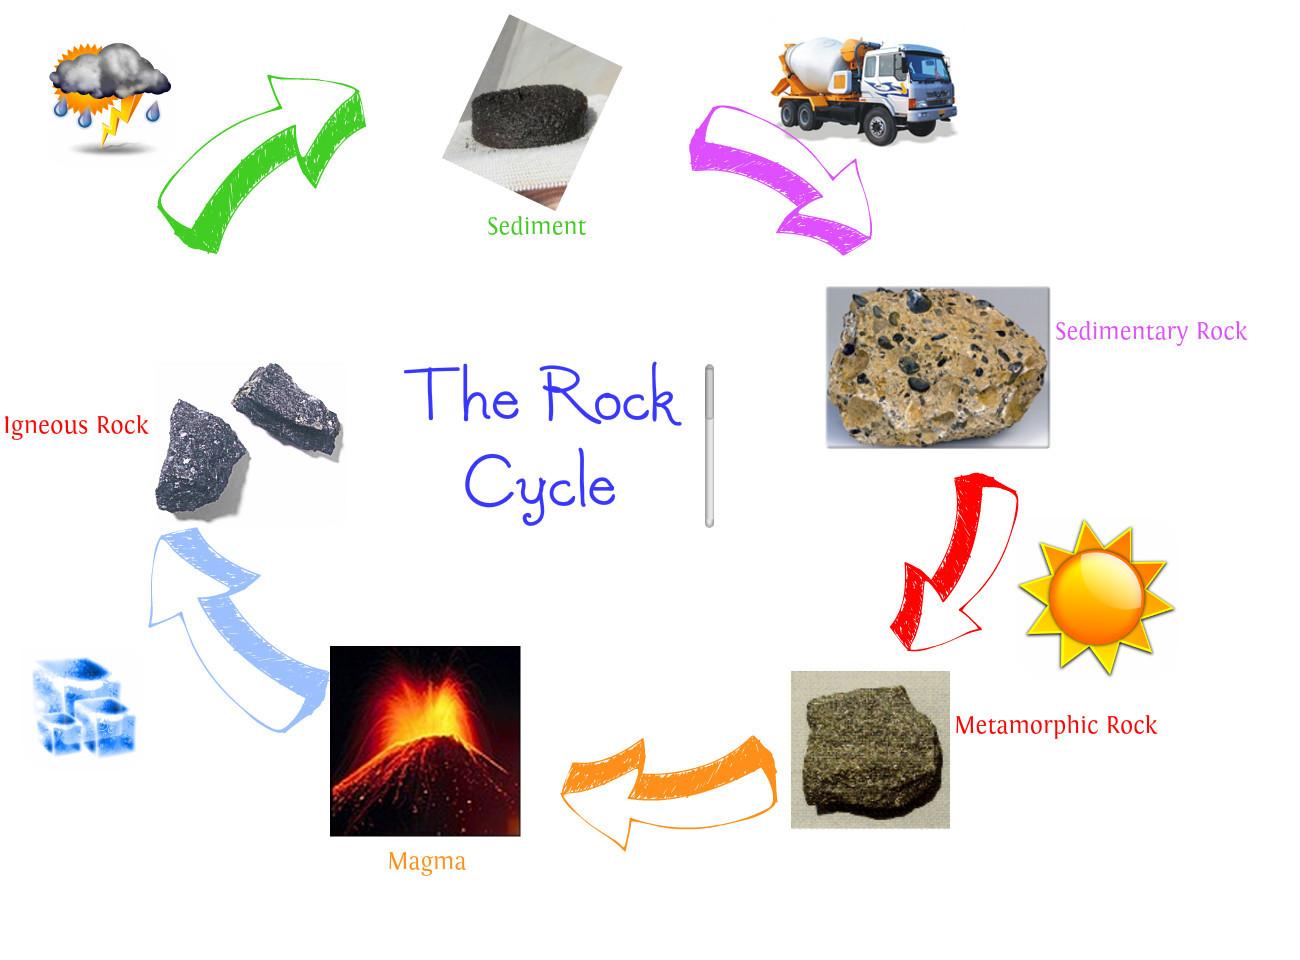 Basic information on Sedimentary rocks